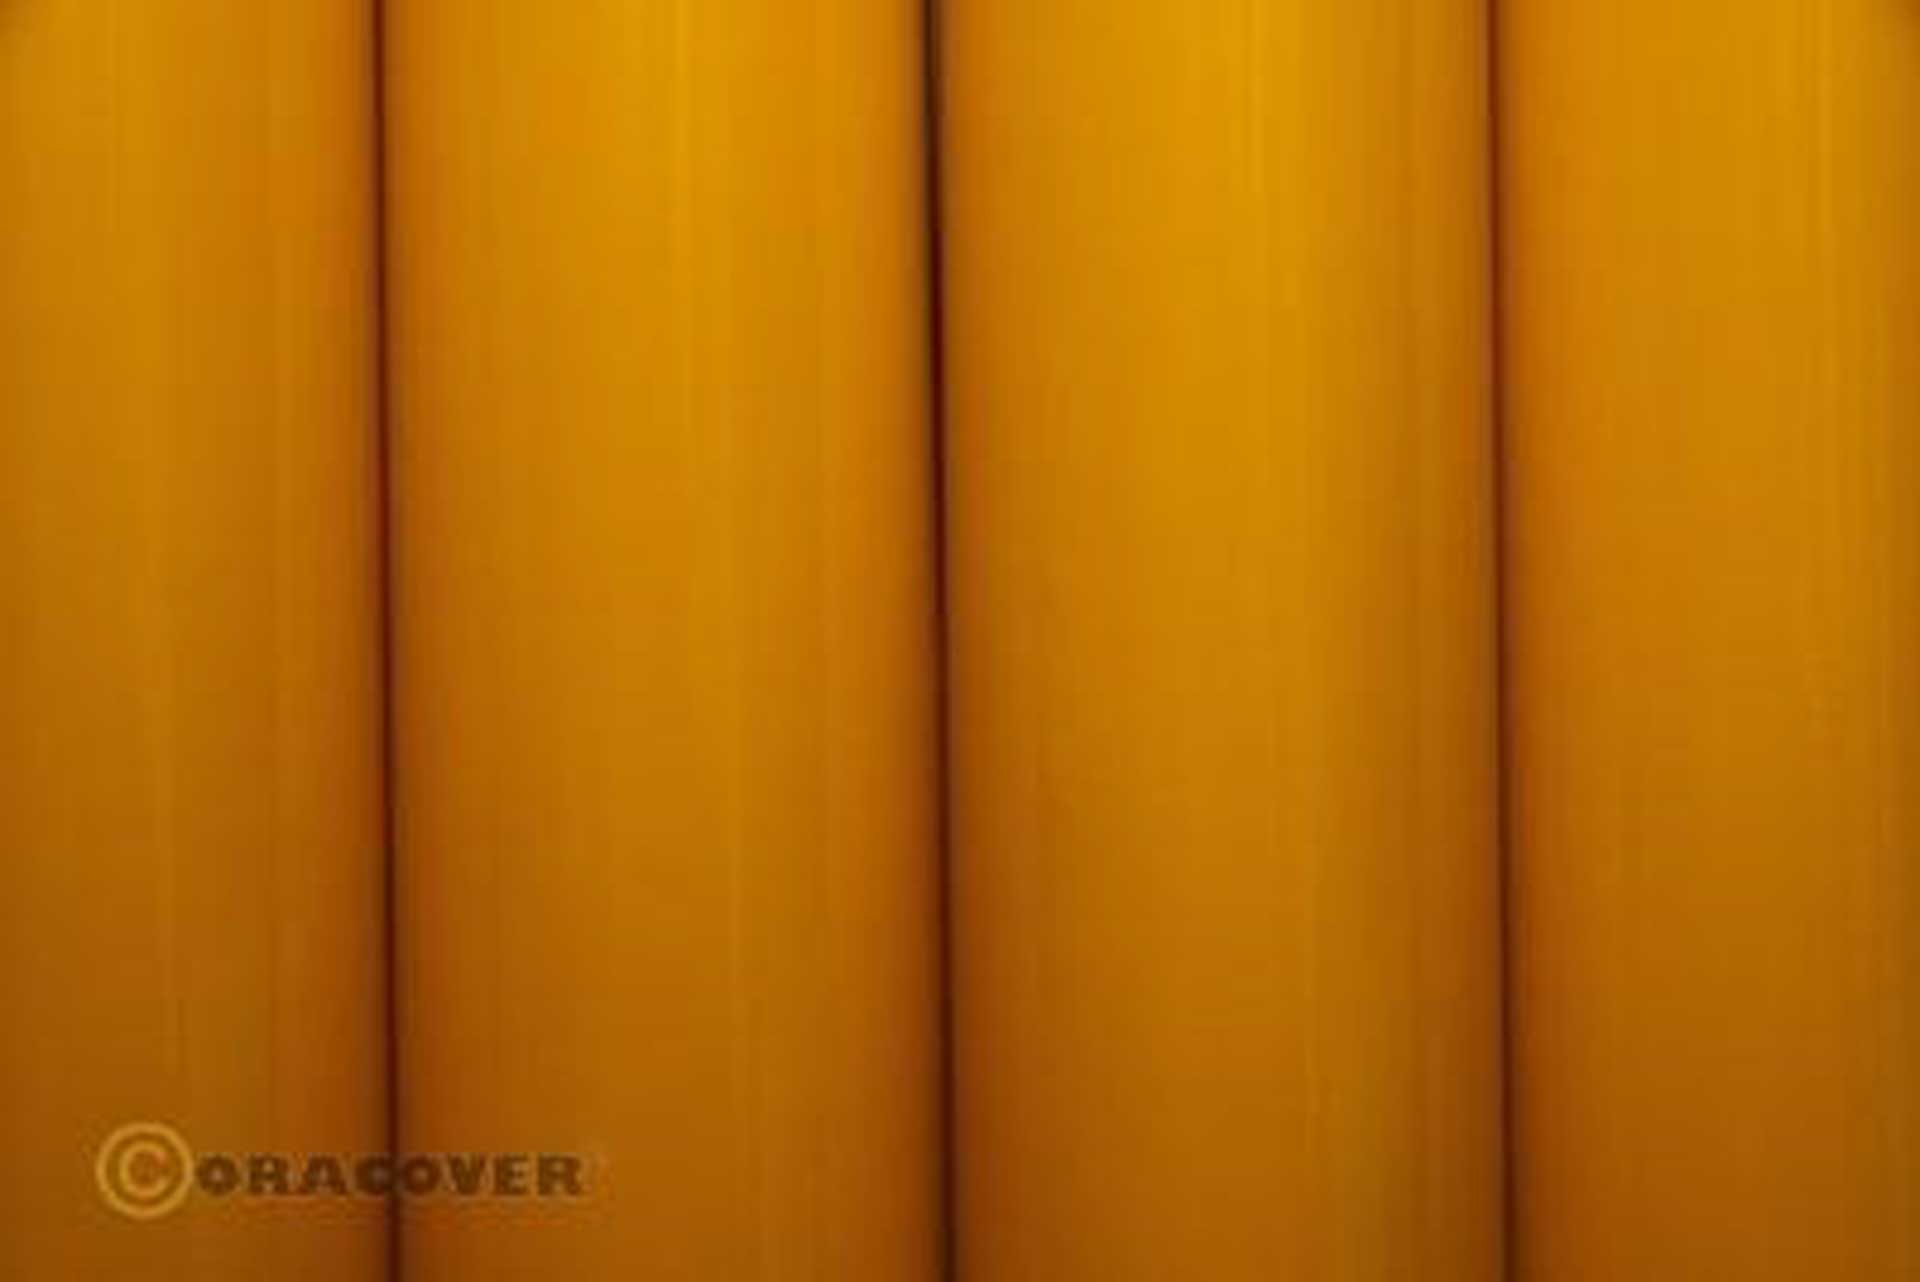 ORACOVER Bügelfolie Scale Goldgelb 2 Meter # 32